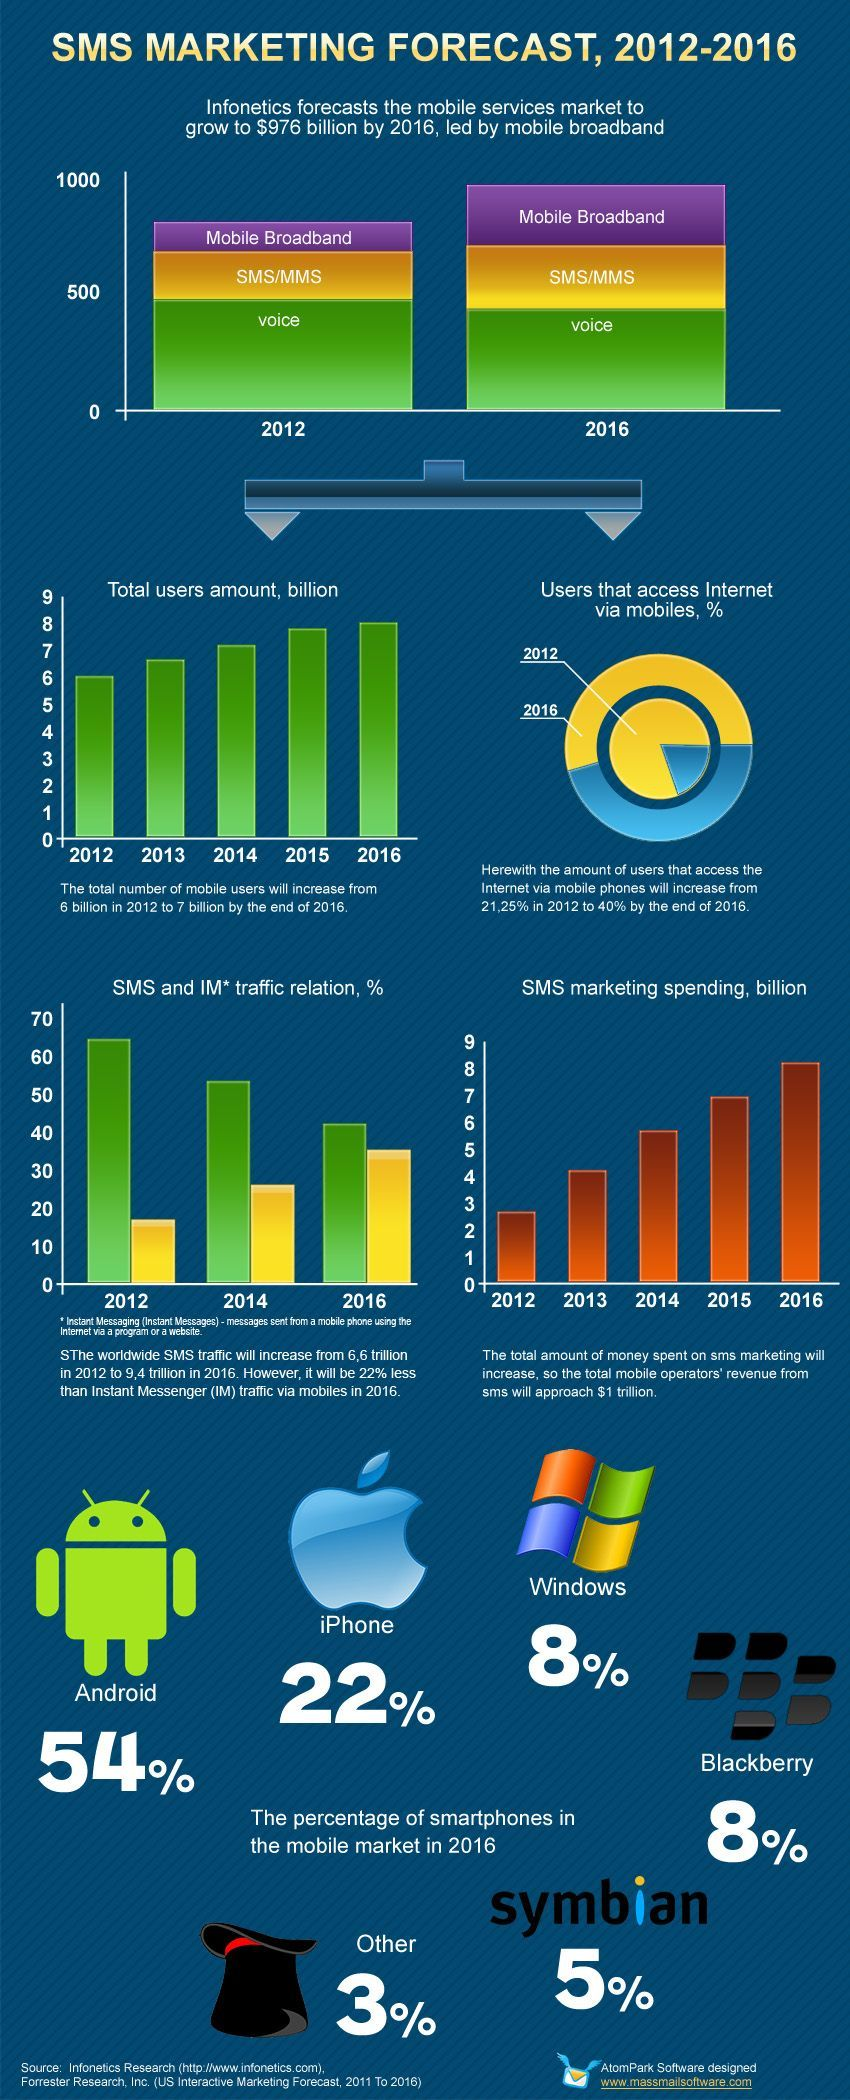 SMS Marketing Forecast Sms marketing, Mobile marketing